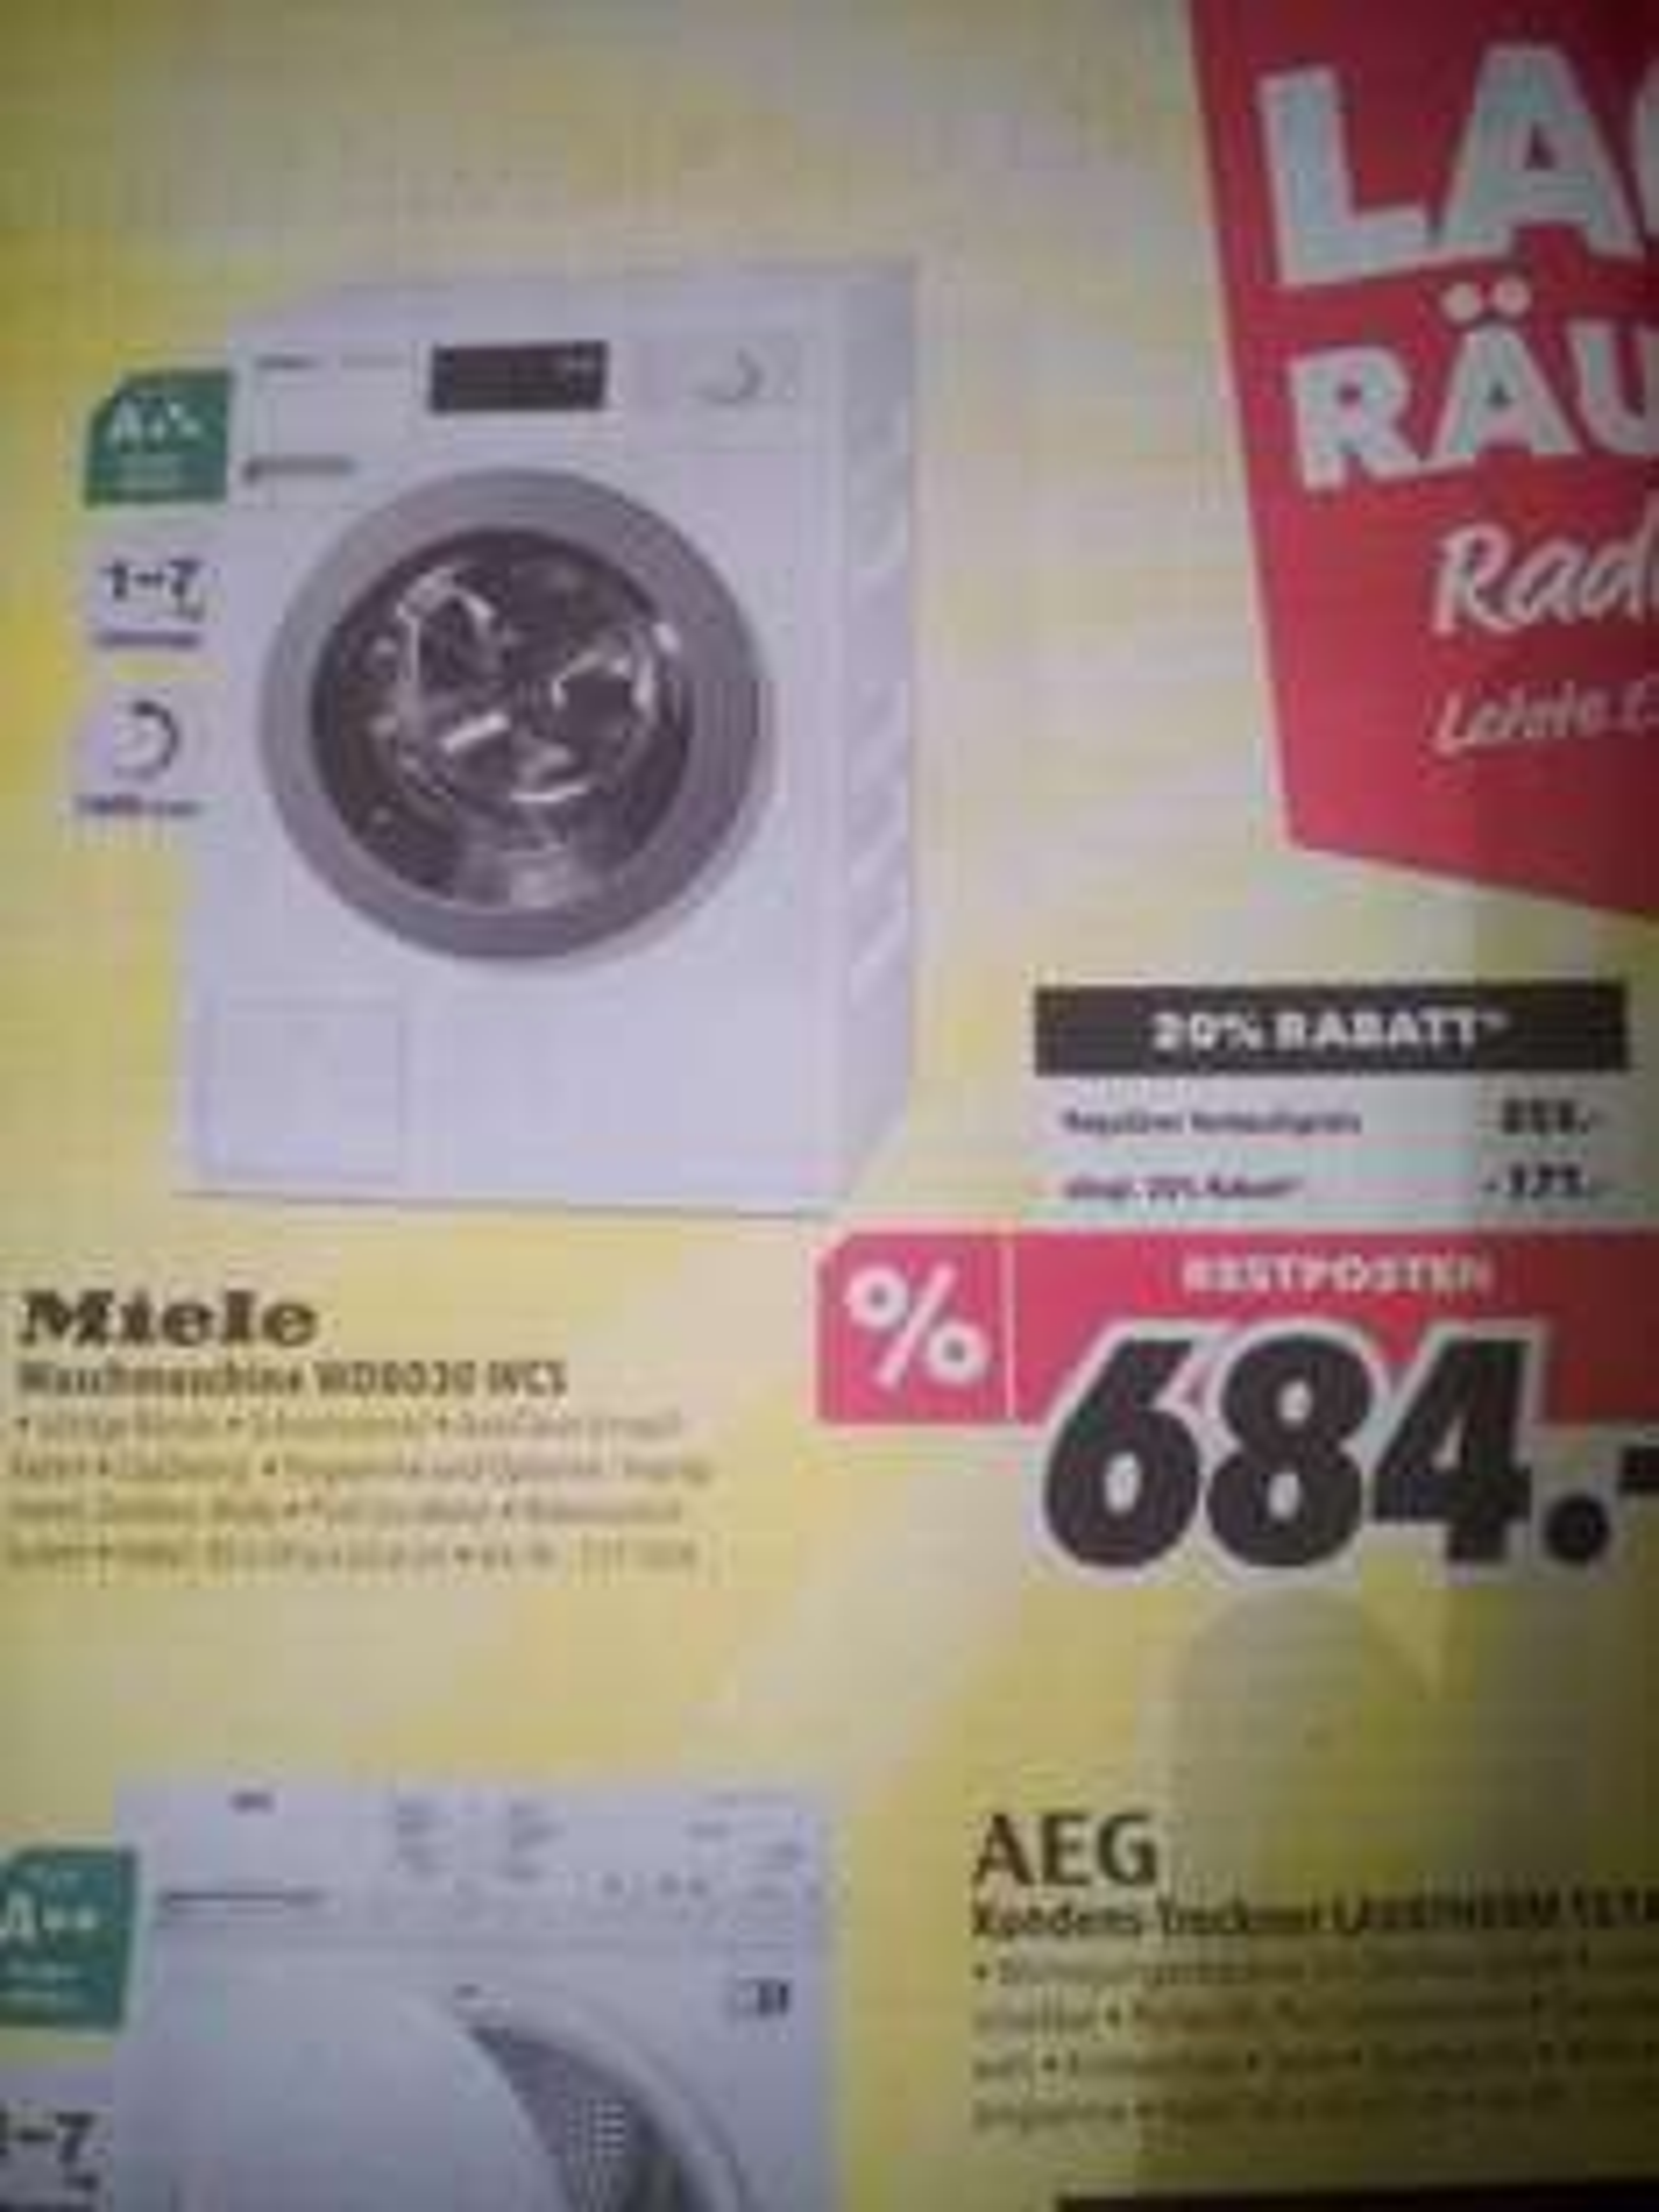 (Lokal) Medimax Miele A+++ Waschmaschine WDB030 WCS für 684€